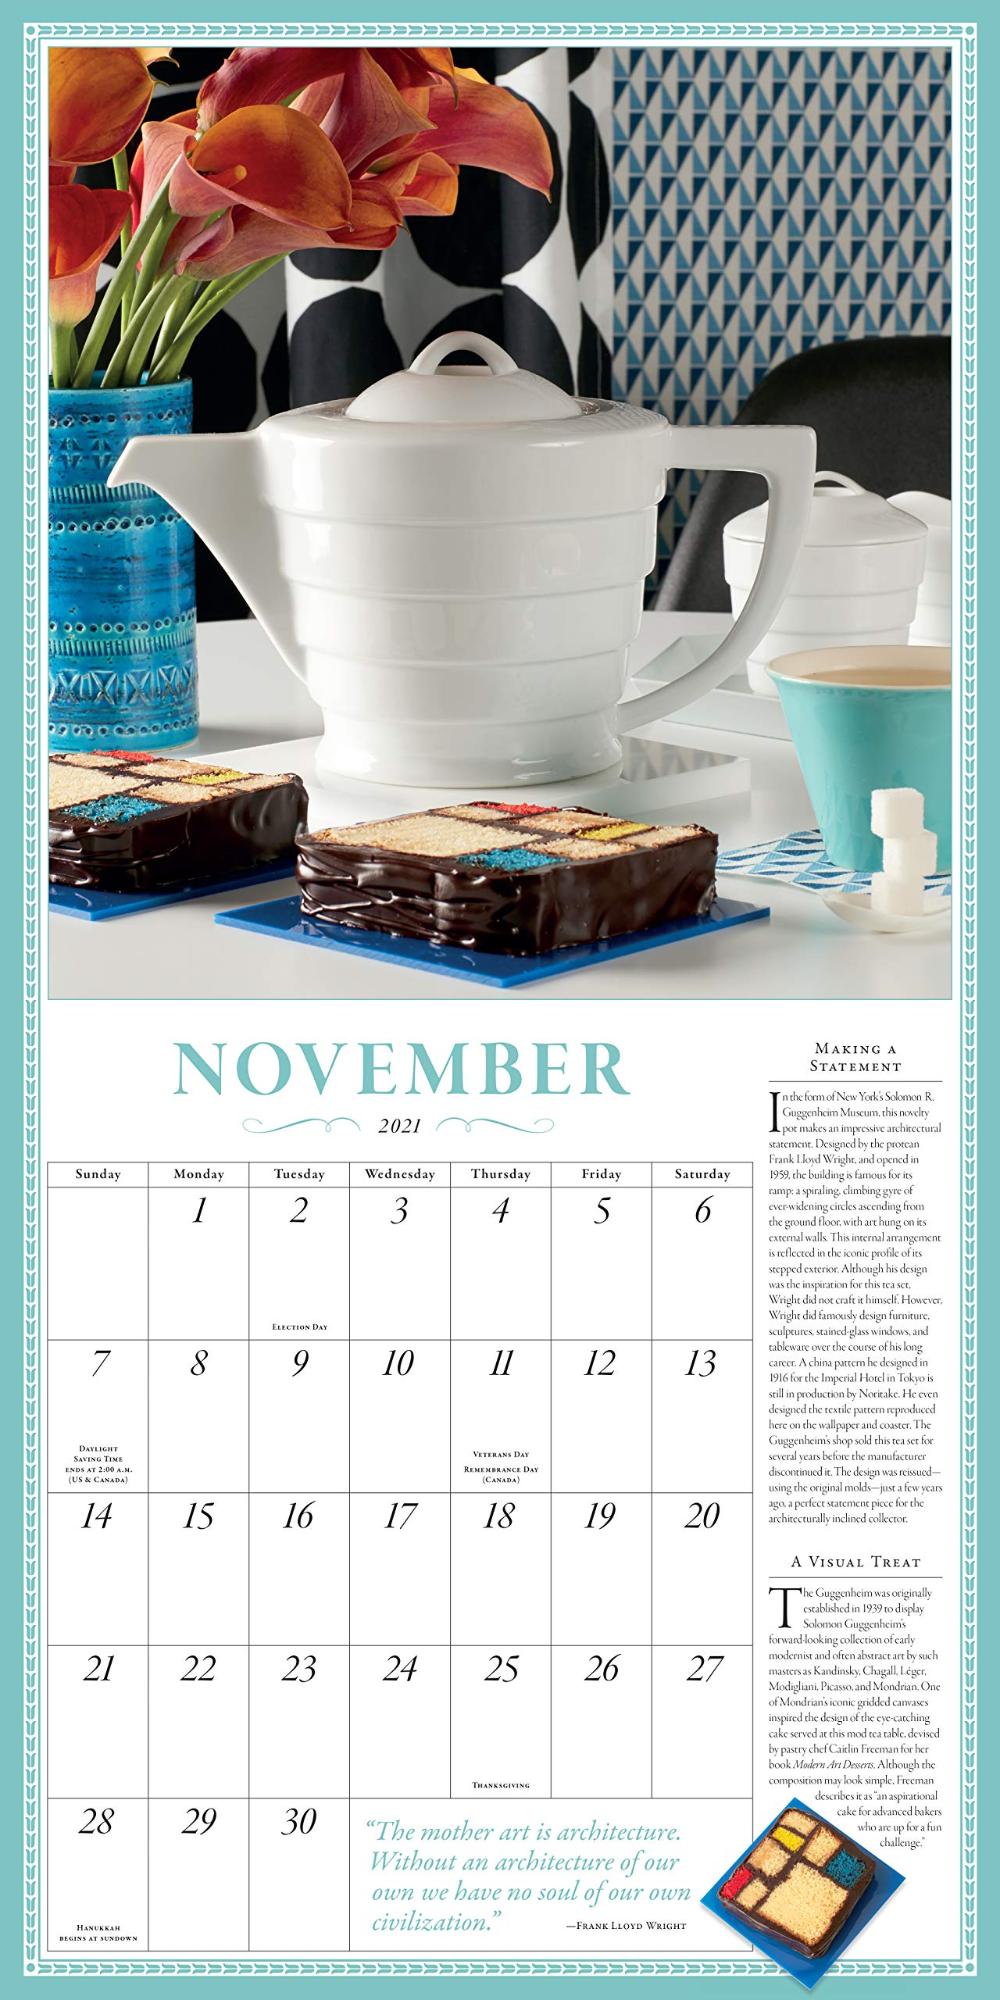 Collectible Teapot Tea Wall Calendar 2021 Workman Publishing 9781523508914 Amazon Com Books In 2020 Wall Calendar Tea Pots Calendar